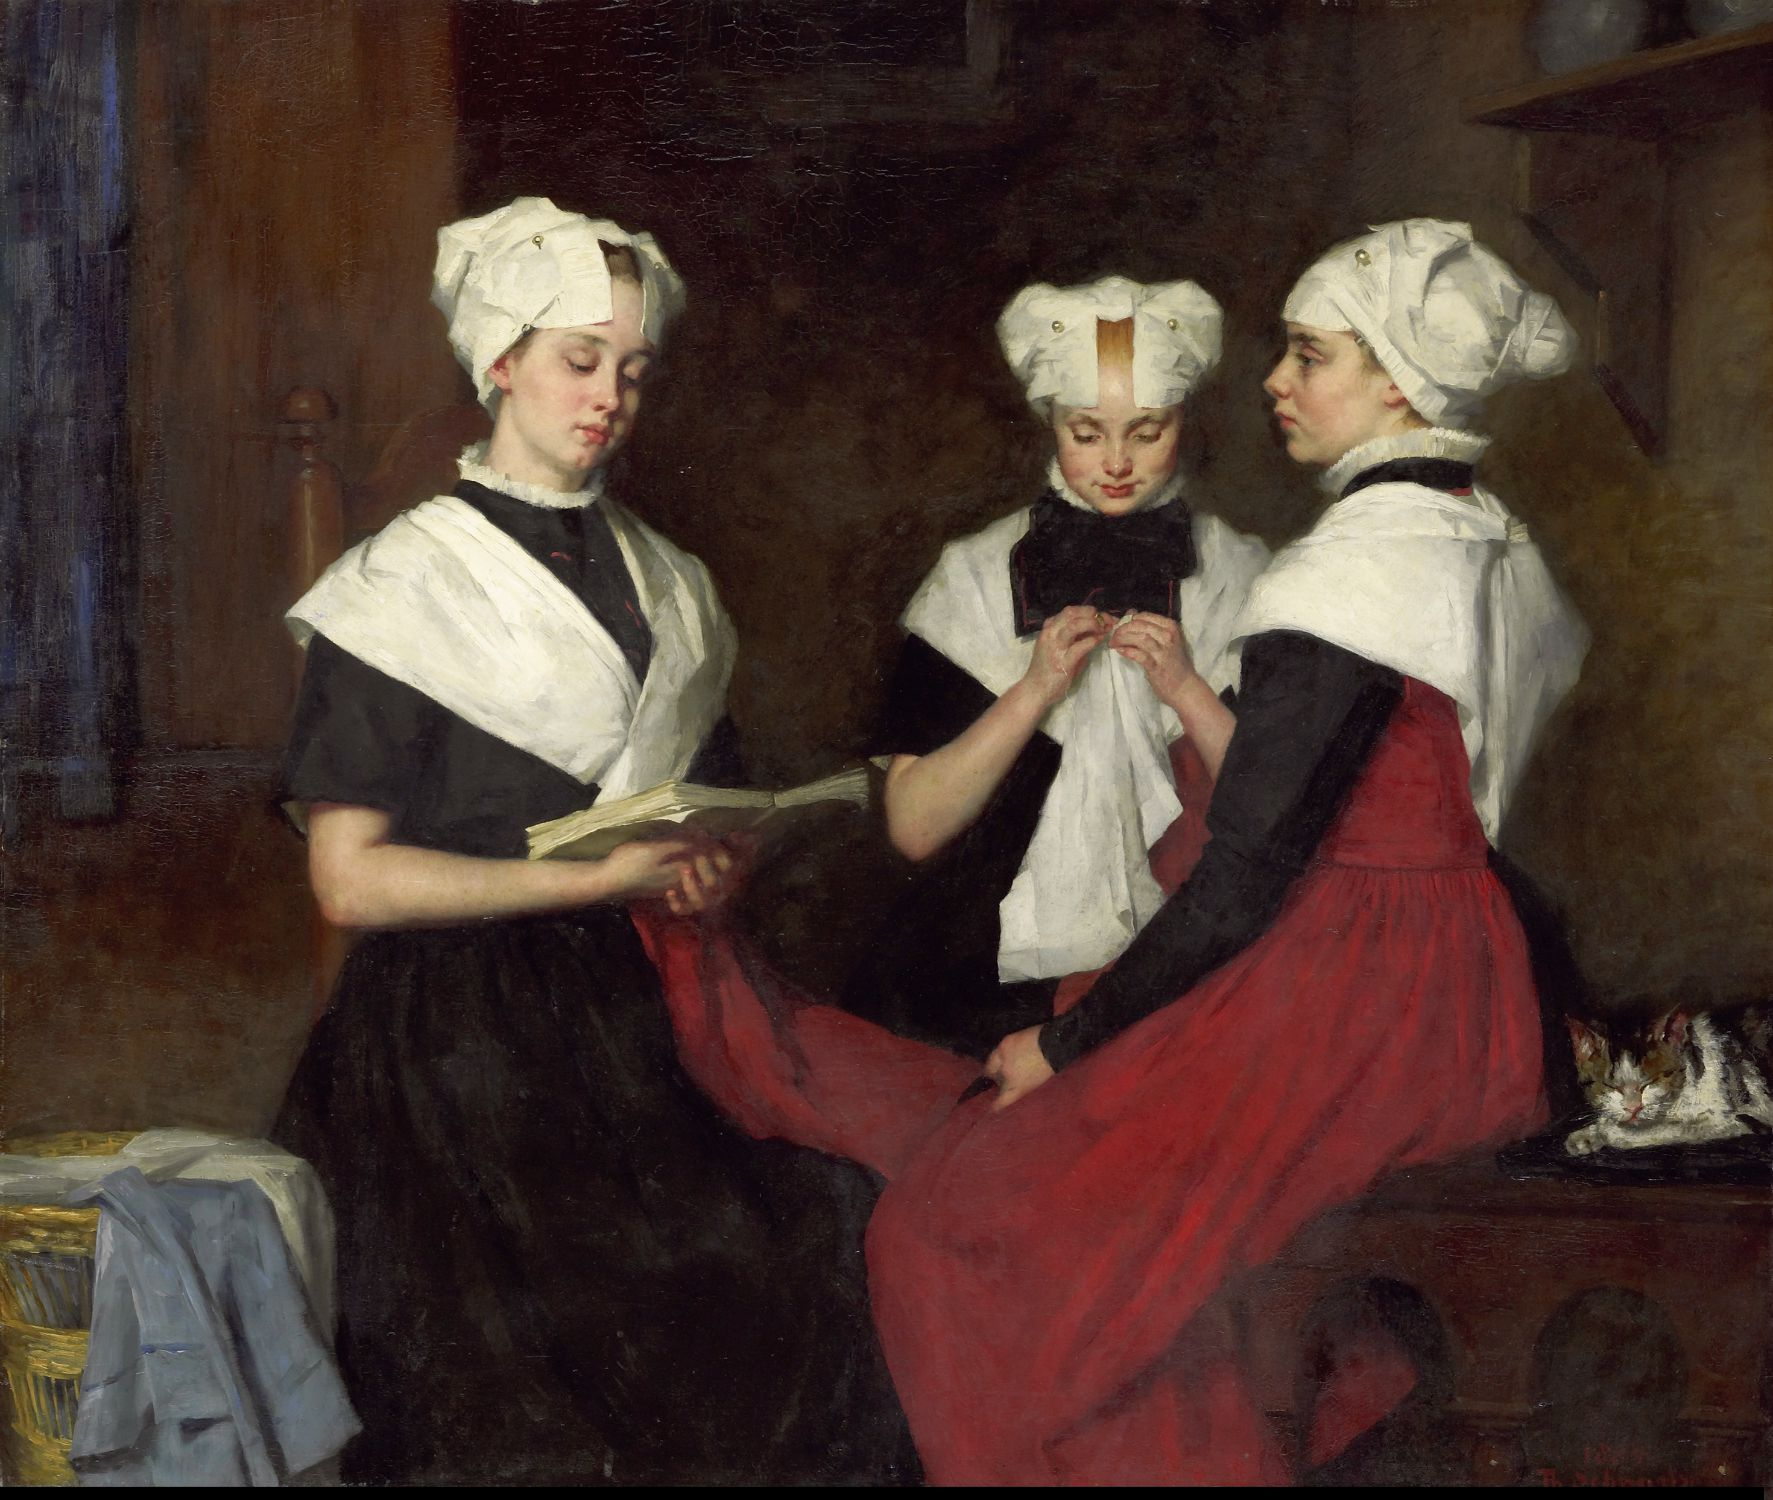 Thérèse Schwartze (Dutch Painter), Drie Meisjes uit het Amsterdamse Burgerweeshuis, 1885, oil on canvas